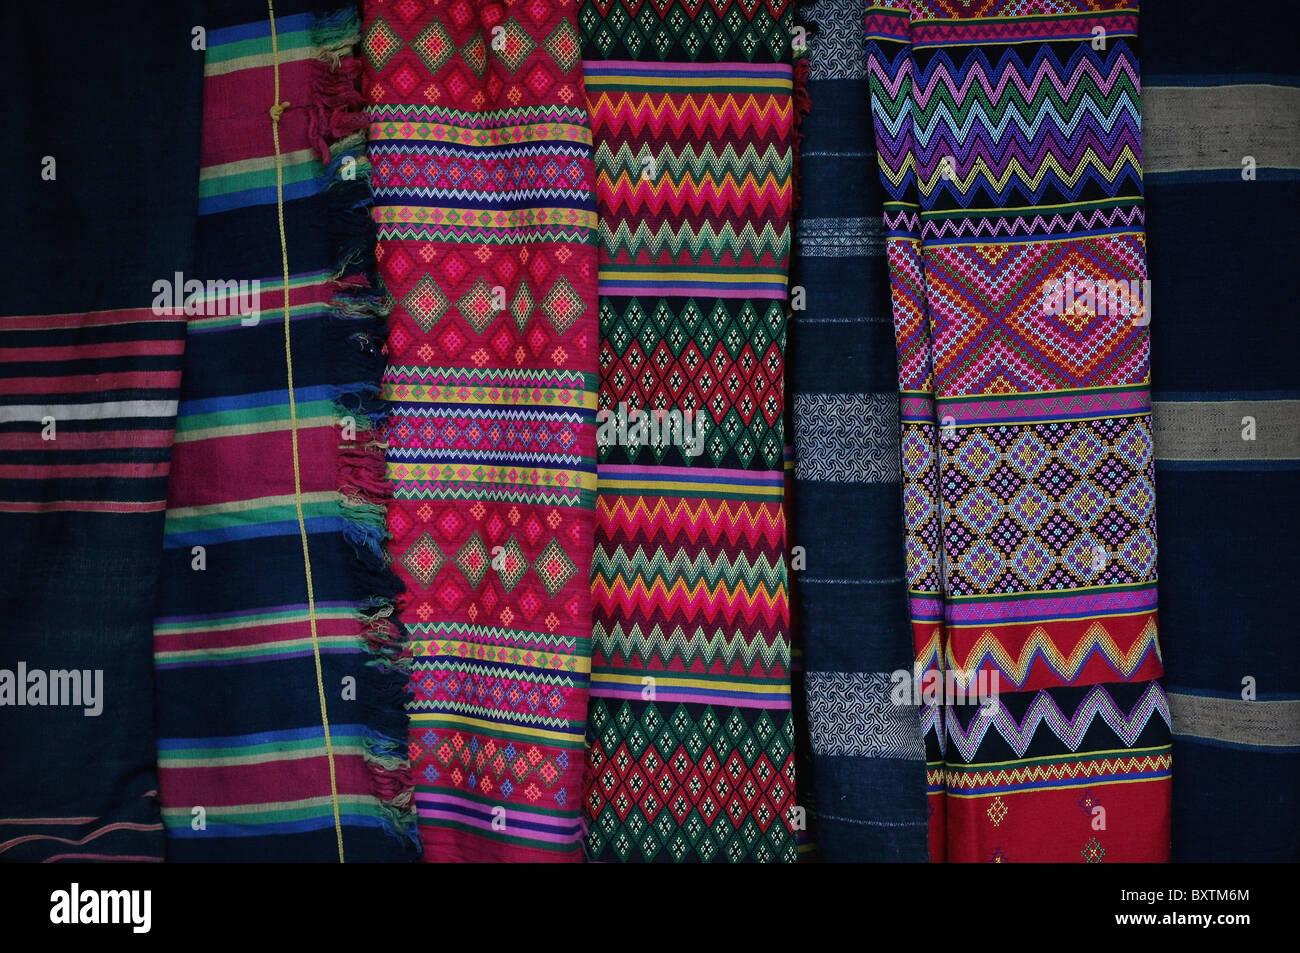 Colorful Traditional Mizo Textiles, Close Up Stock Photo - Alamy